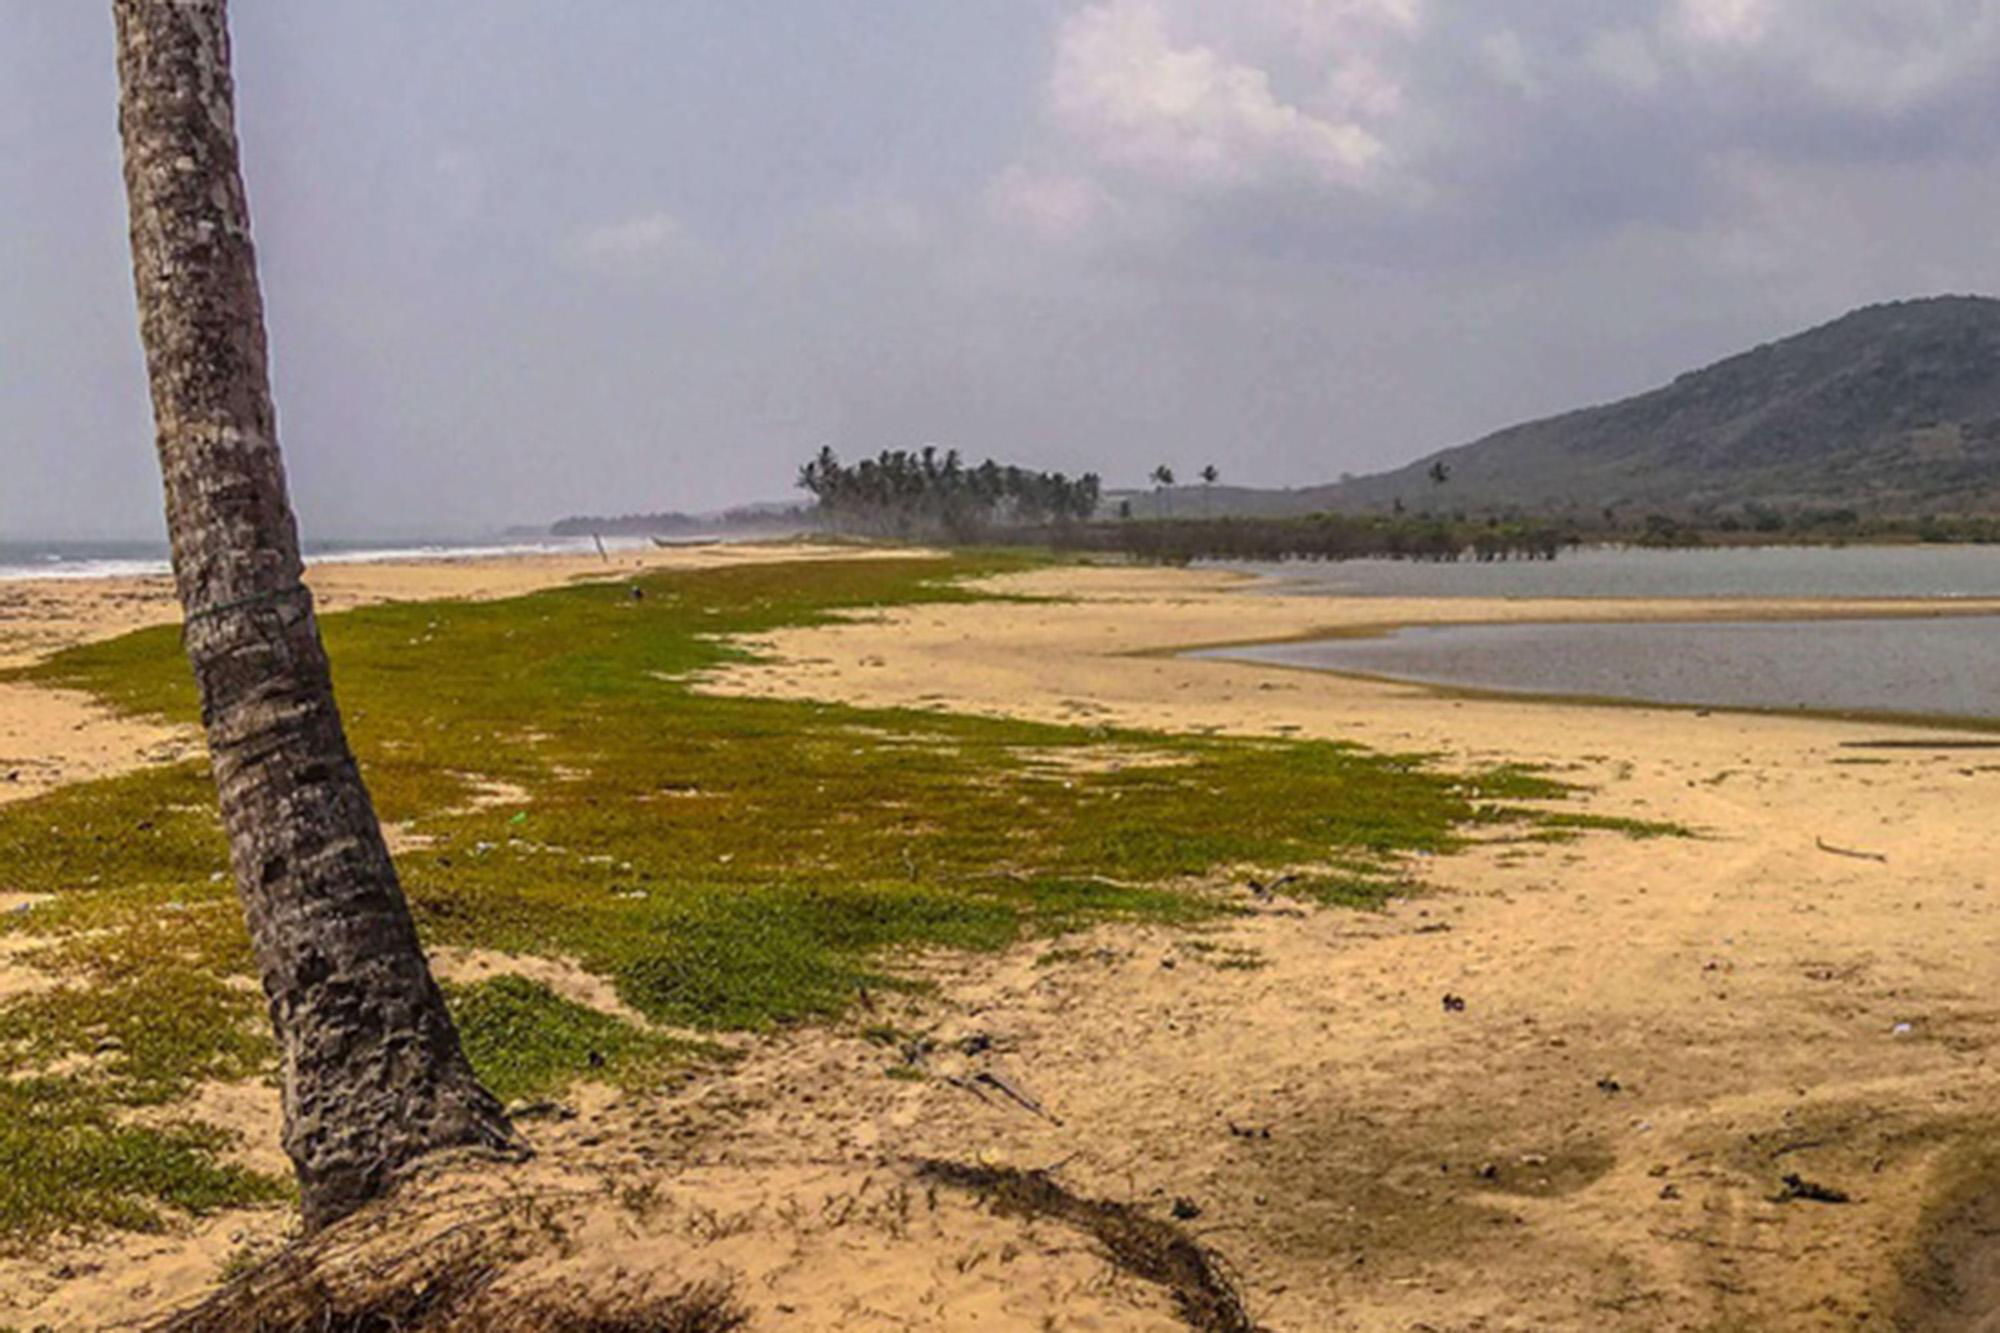 coastal scenery in Ghana